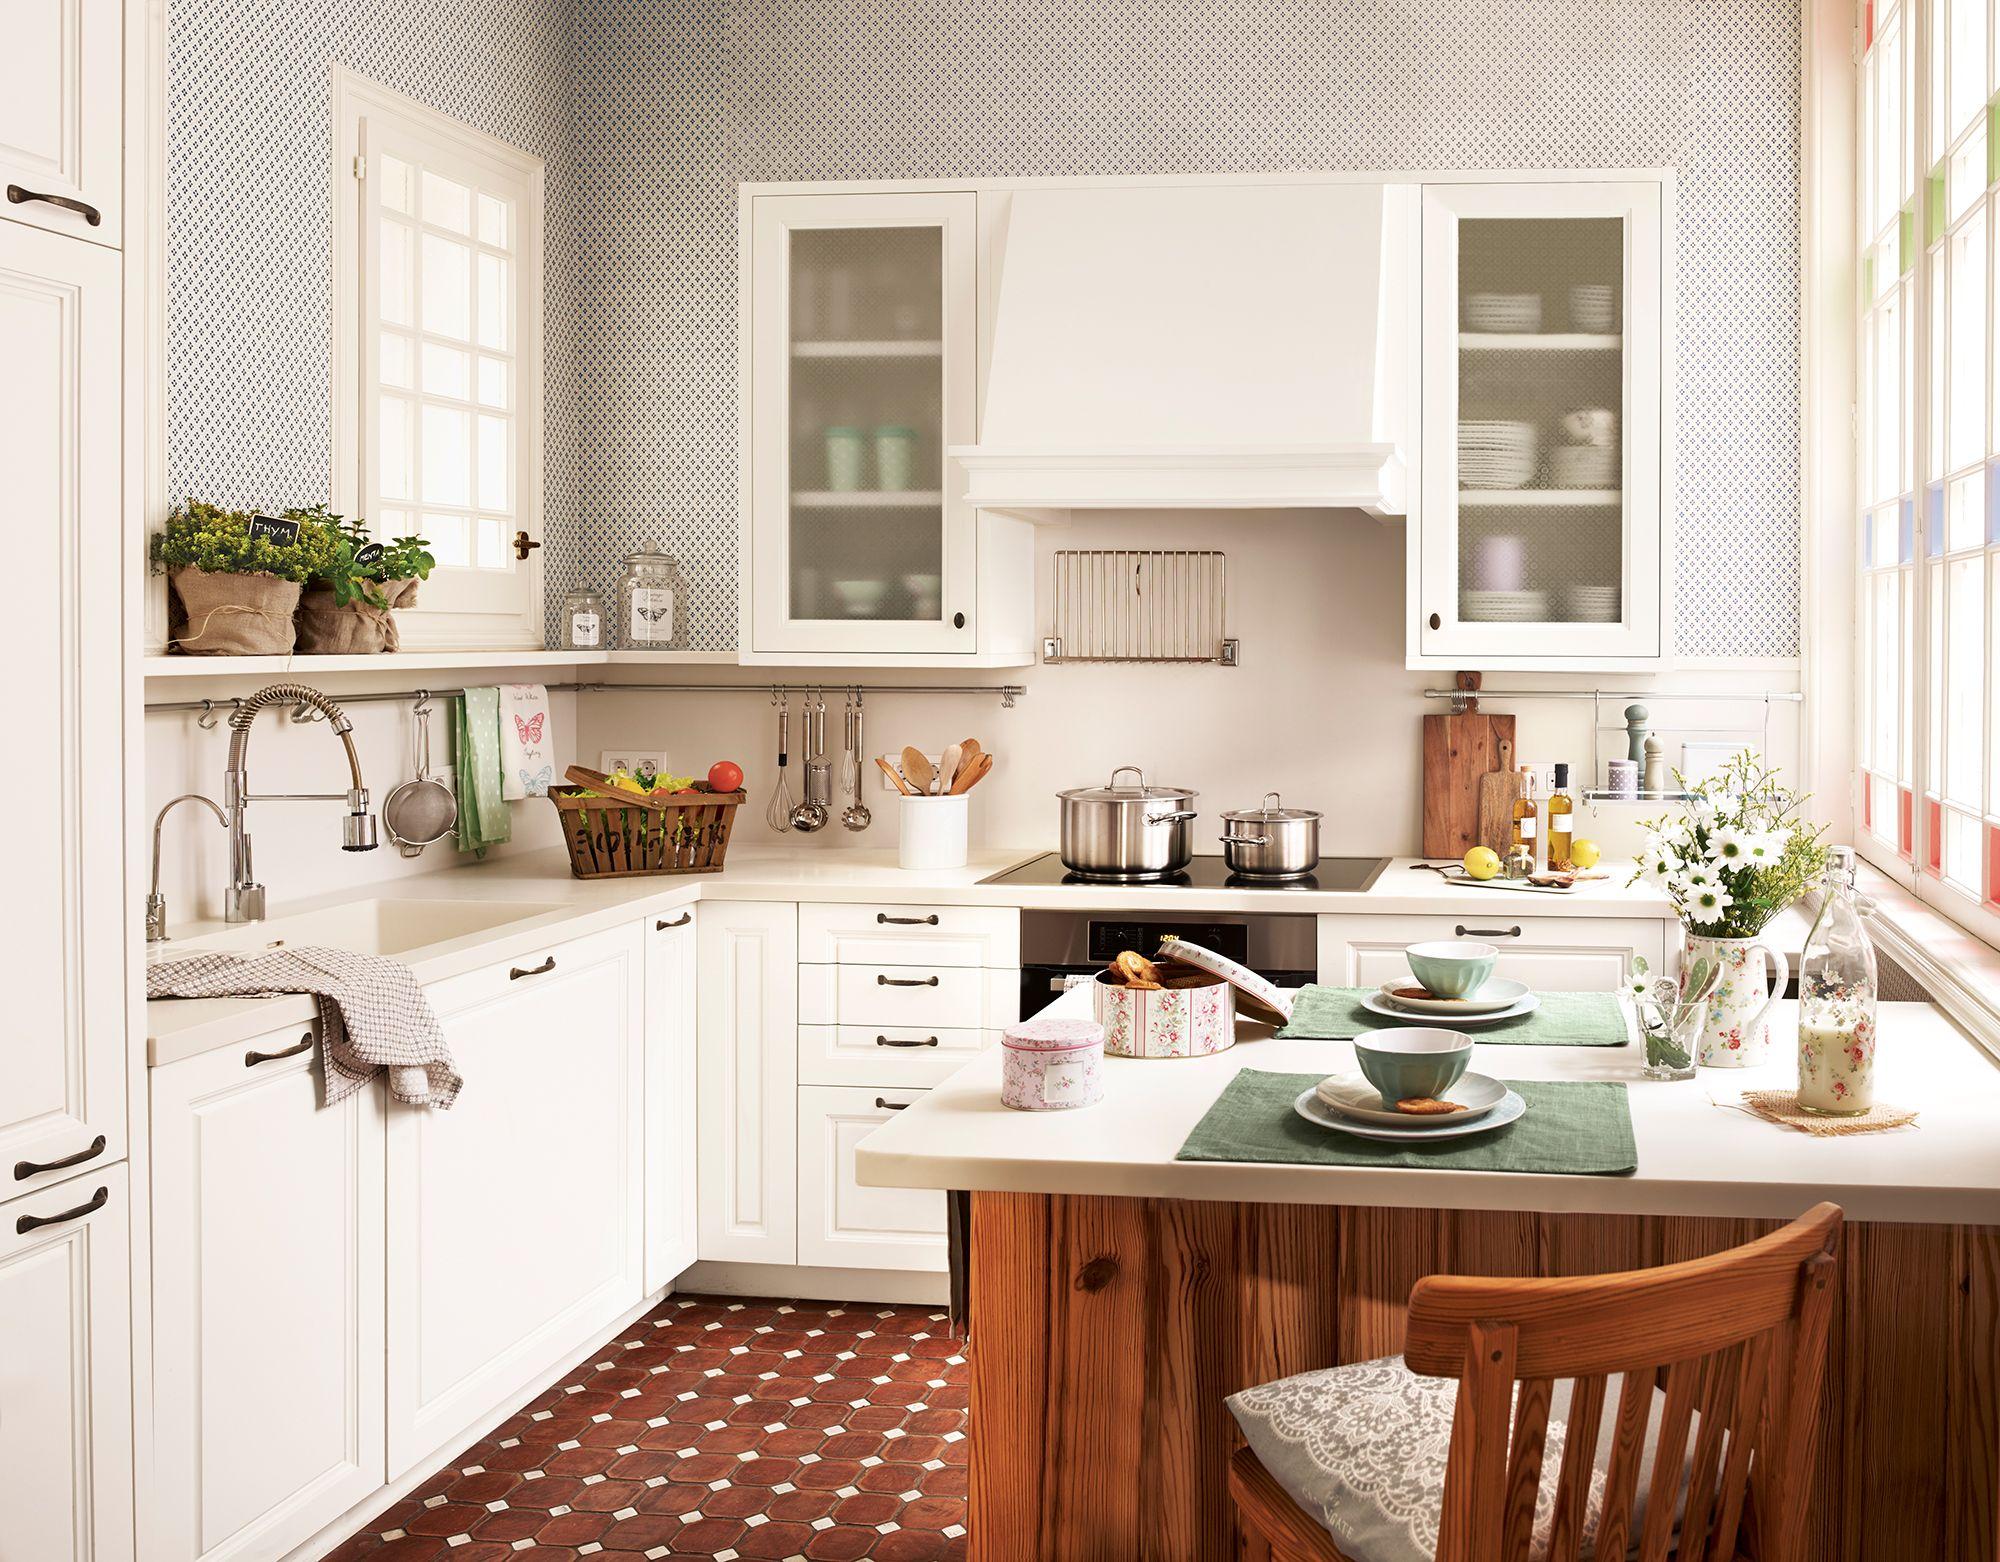 Pin de ustava51 en Кухня | Pinterest | Cocina blanca clásica, Blanco ...